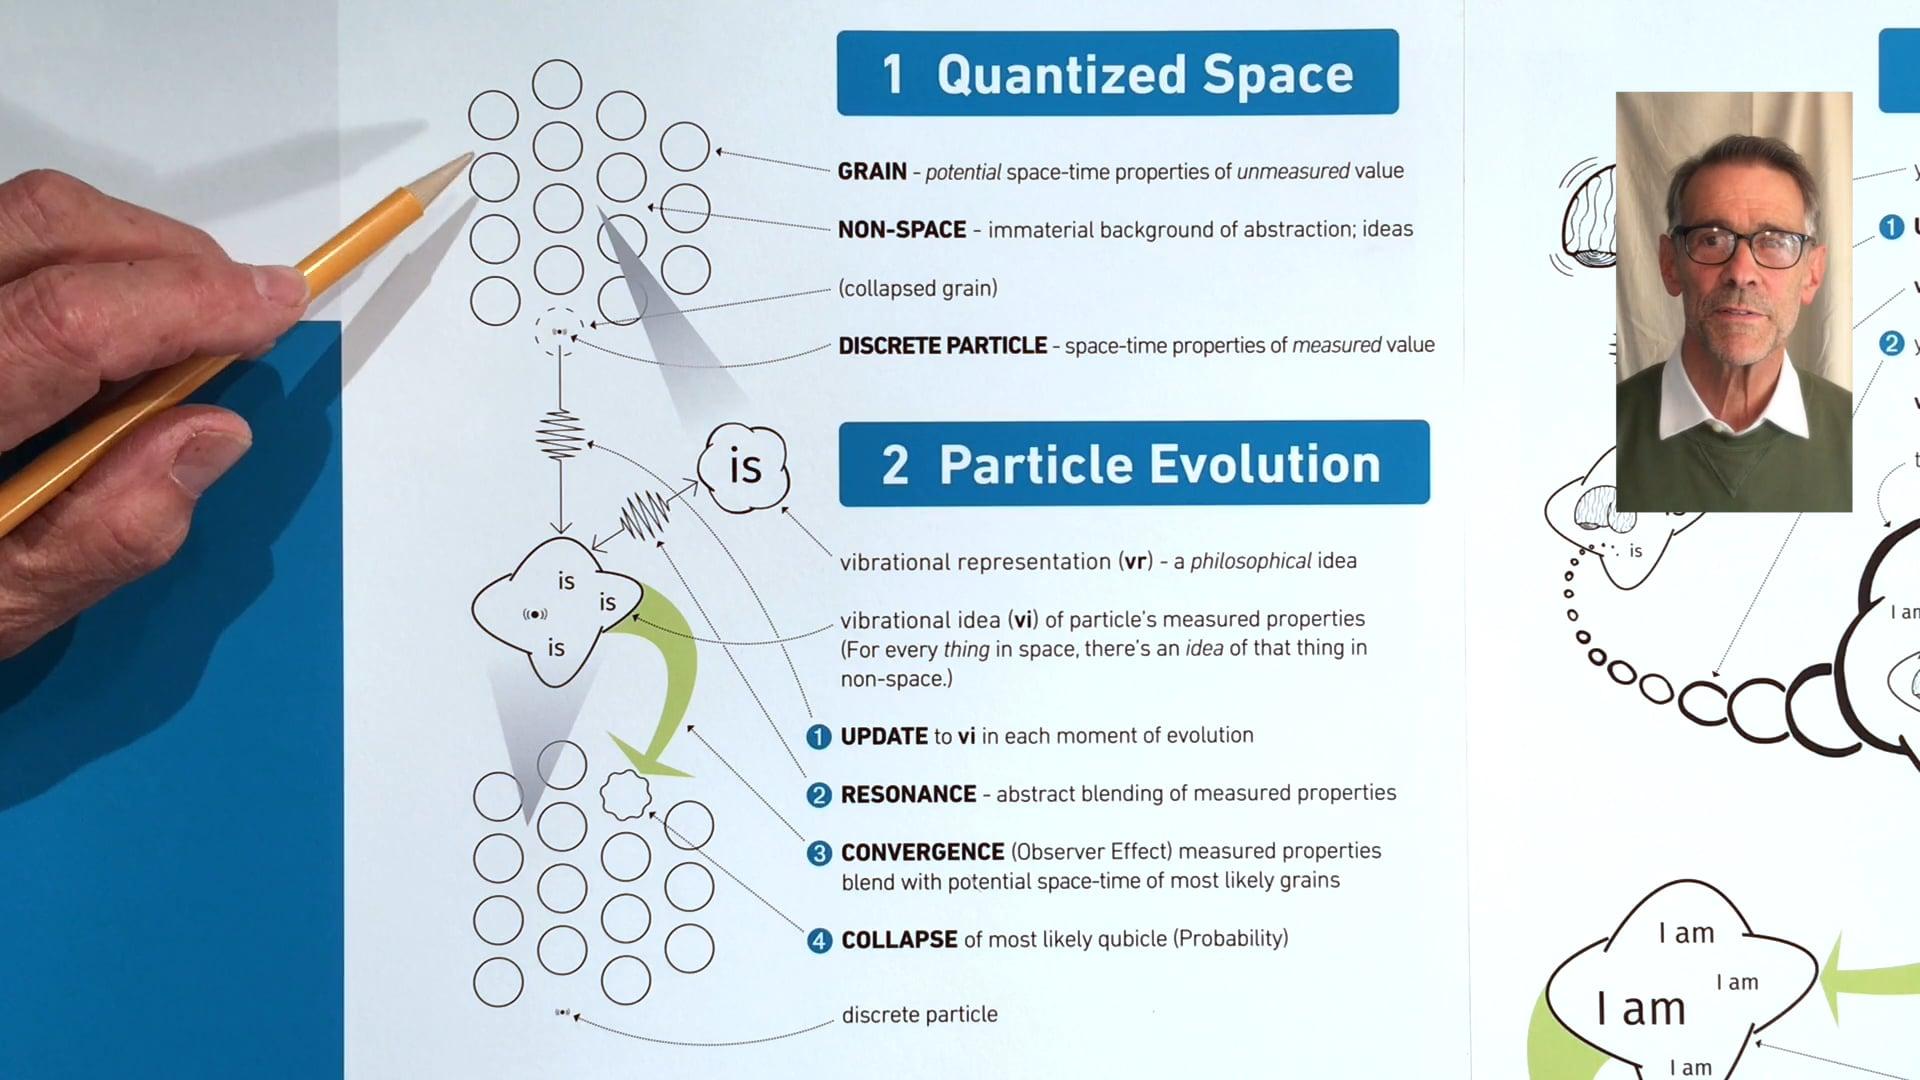 Between Space - Inter-Spacial Abstraction - Gary Blaise Poster Presentation